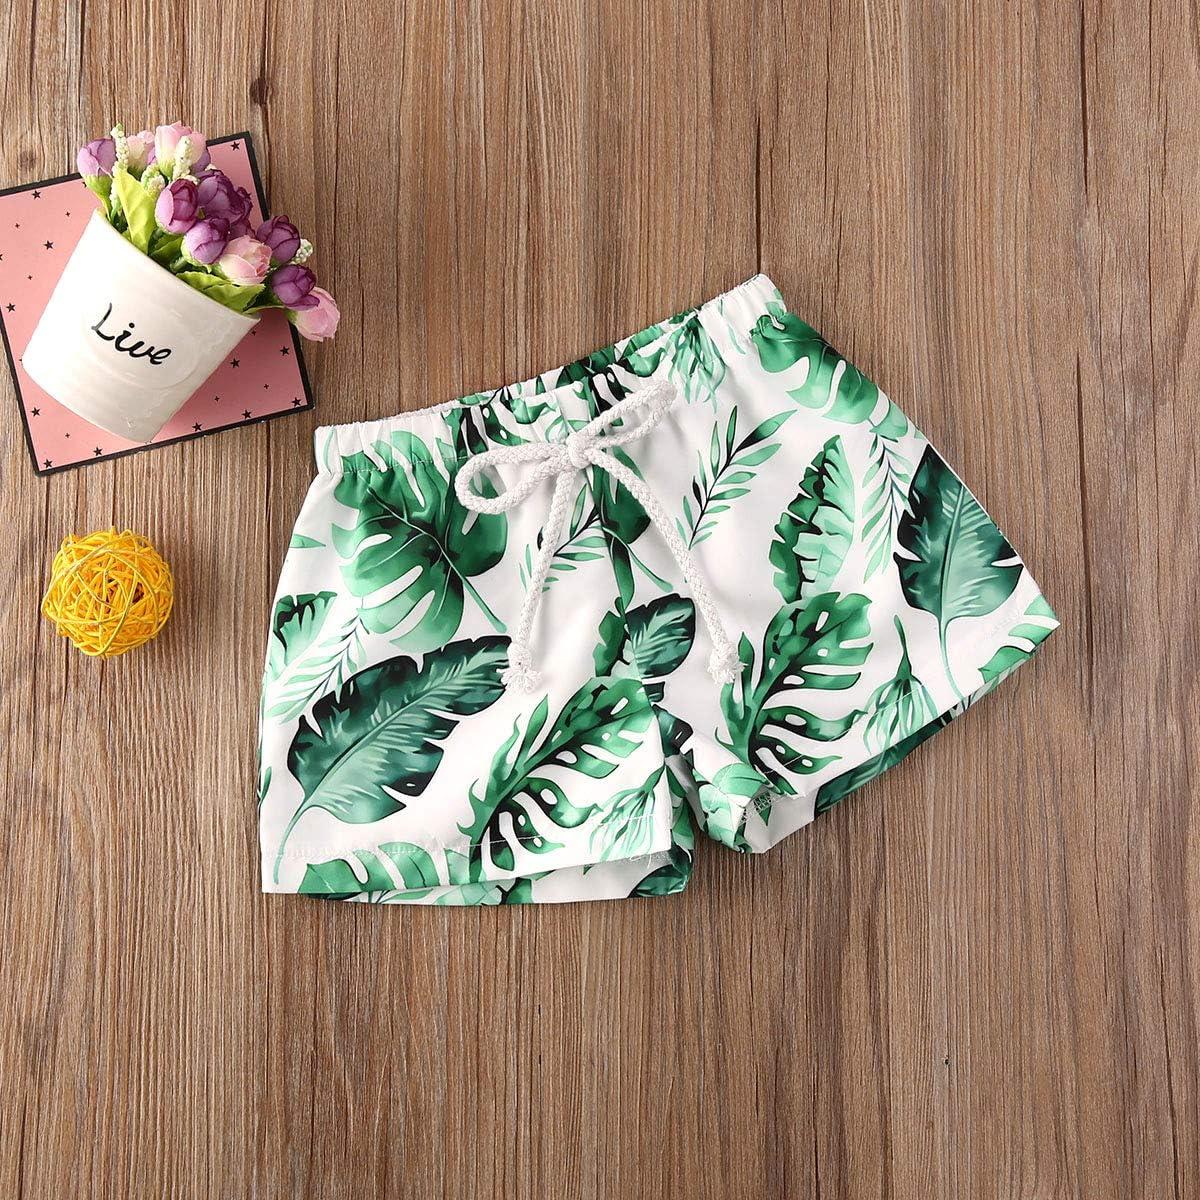 Toddler Baby Boy Hawaiian Beach Shorts Pineapple Leaf Print Swim Trunks Kids Broad Shorts Surf Swimwear